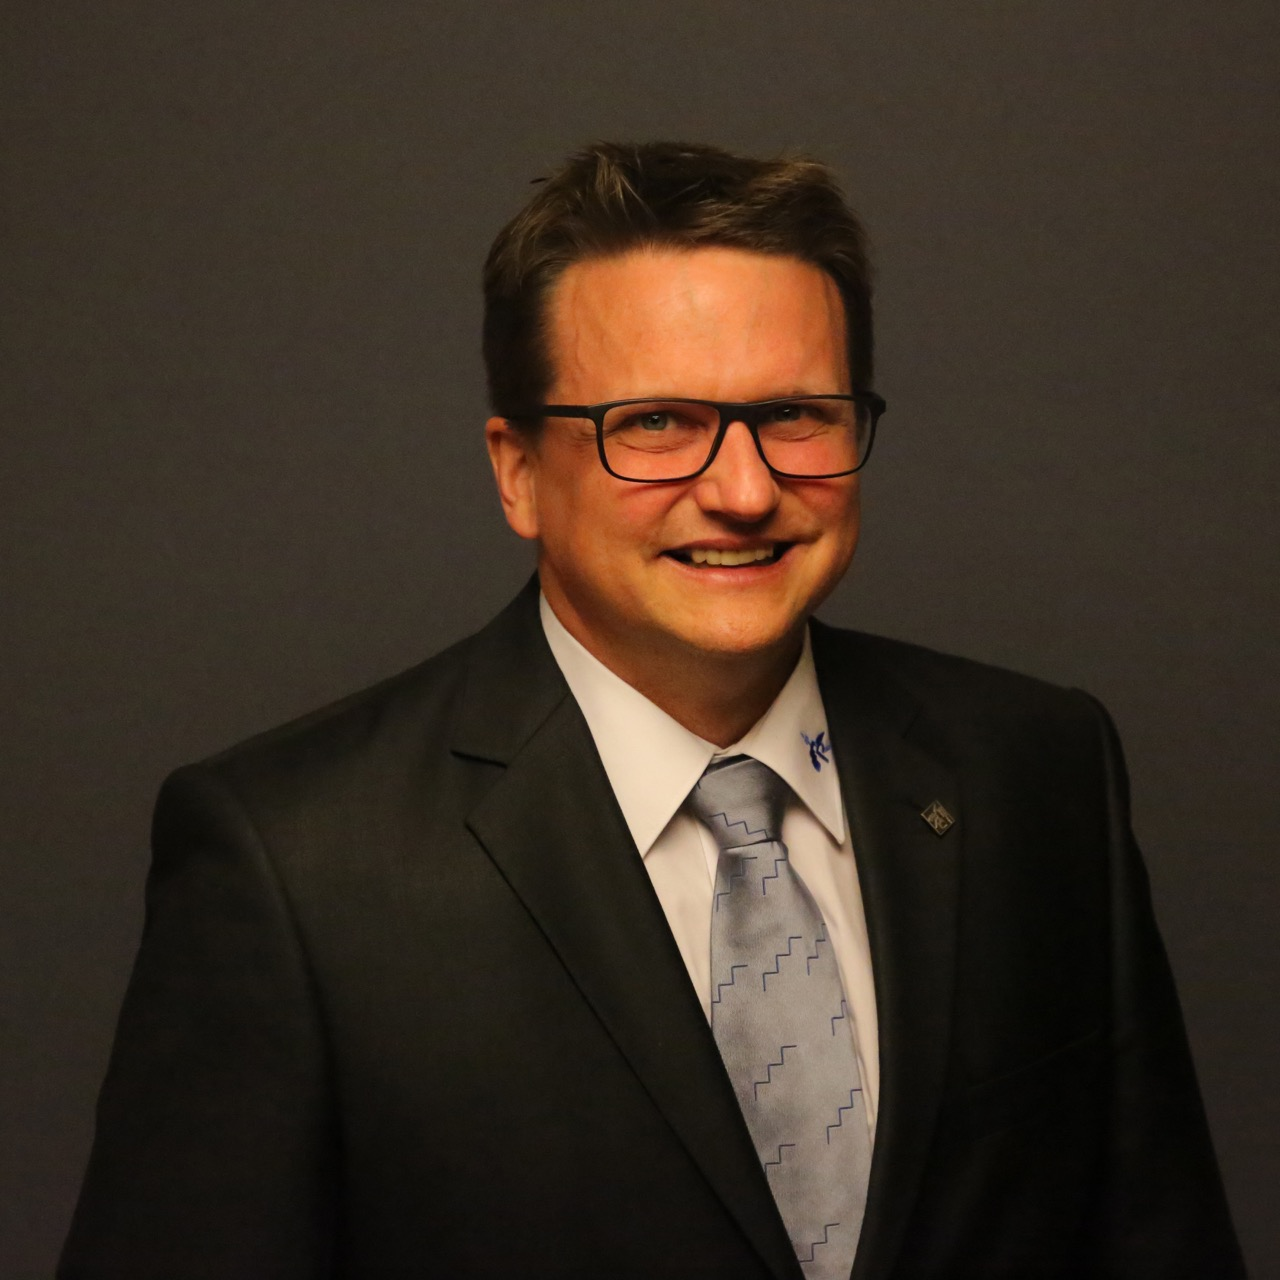 Andreas Hupfer